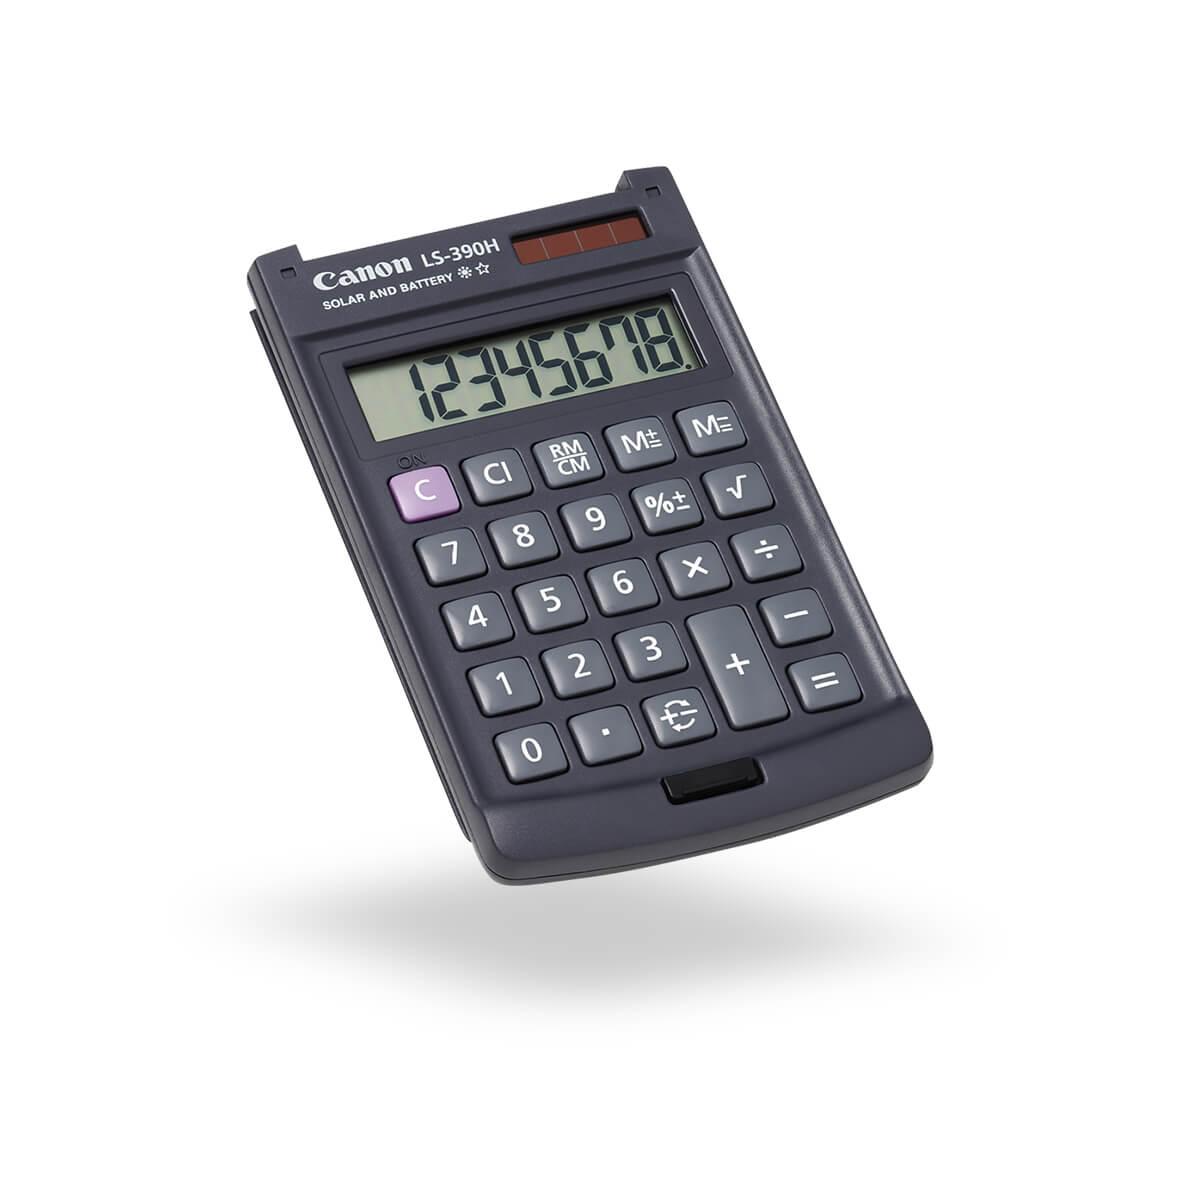 Canon LS-390H pocket calculator